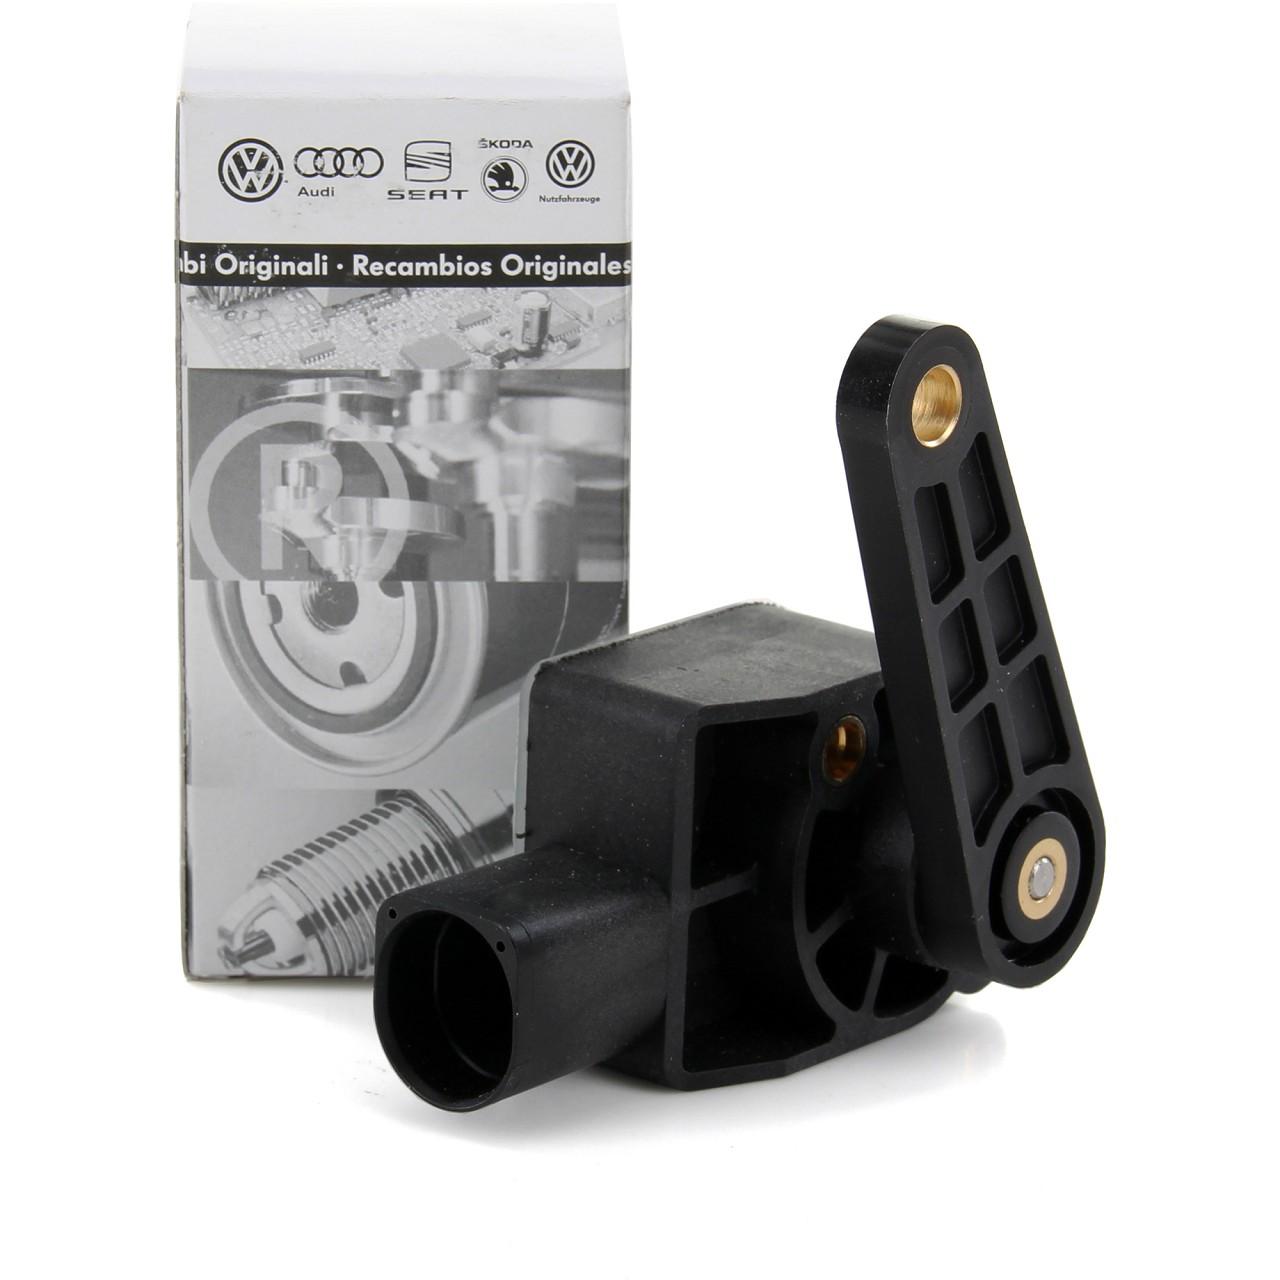 ORIGINAL Audi VW Leuchtweitenregulierung Niveau Sensor Golf V Passat 1T0907503